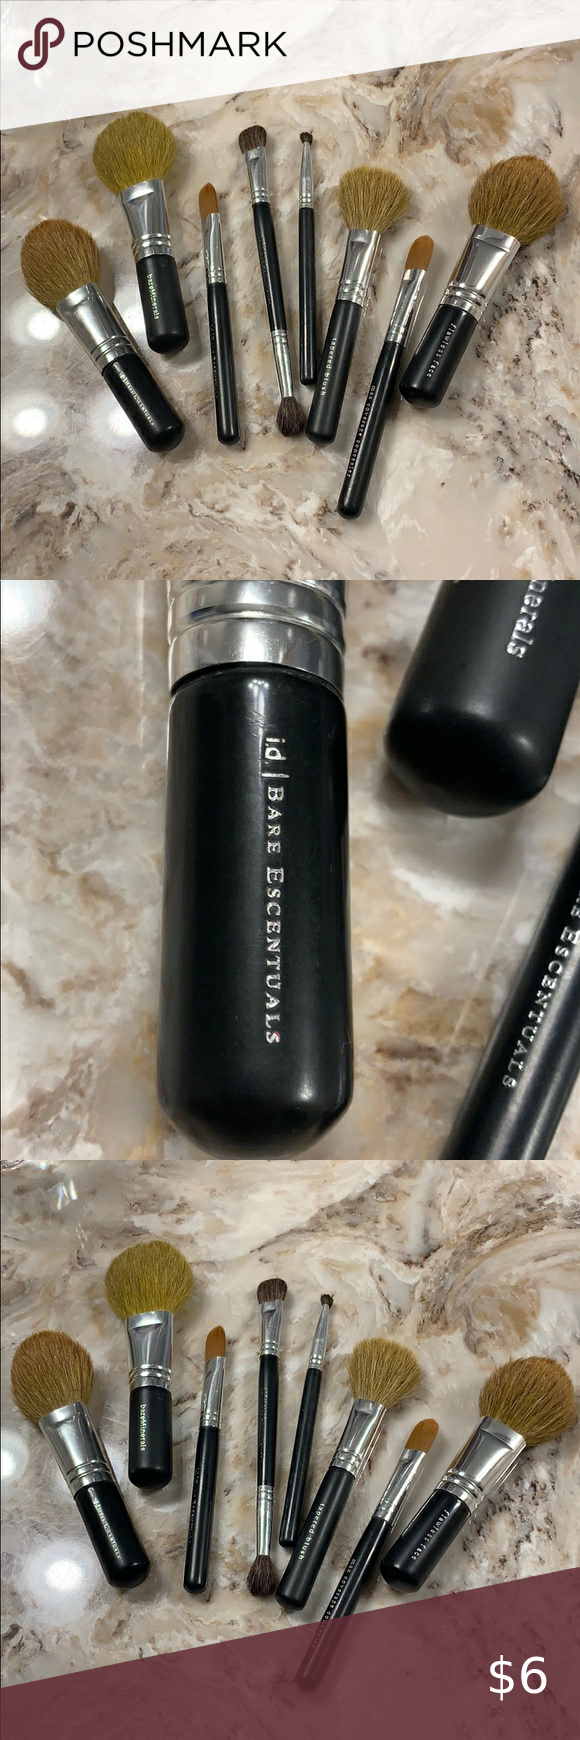 My Posh Picks Bare Minerals makeup brush , 8 piece set